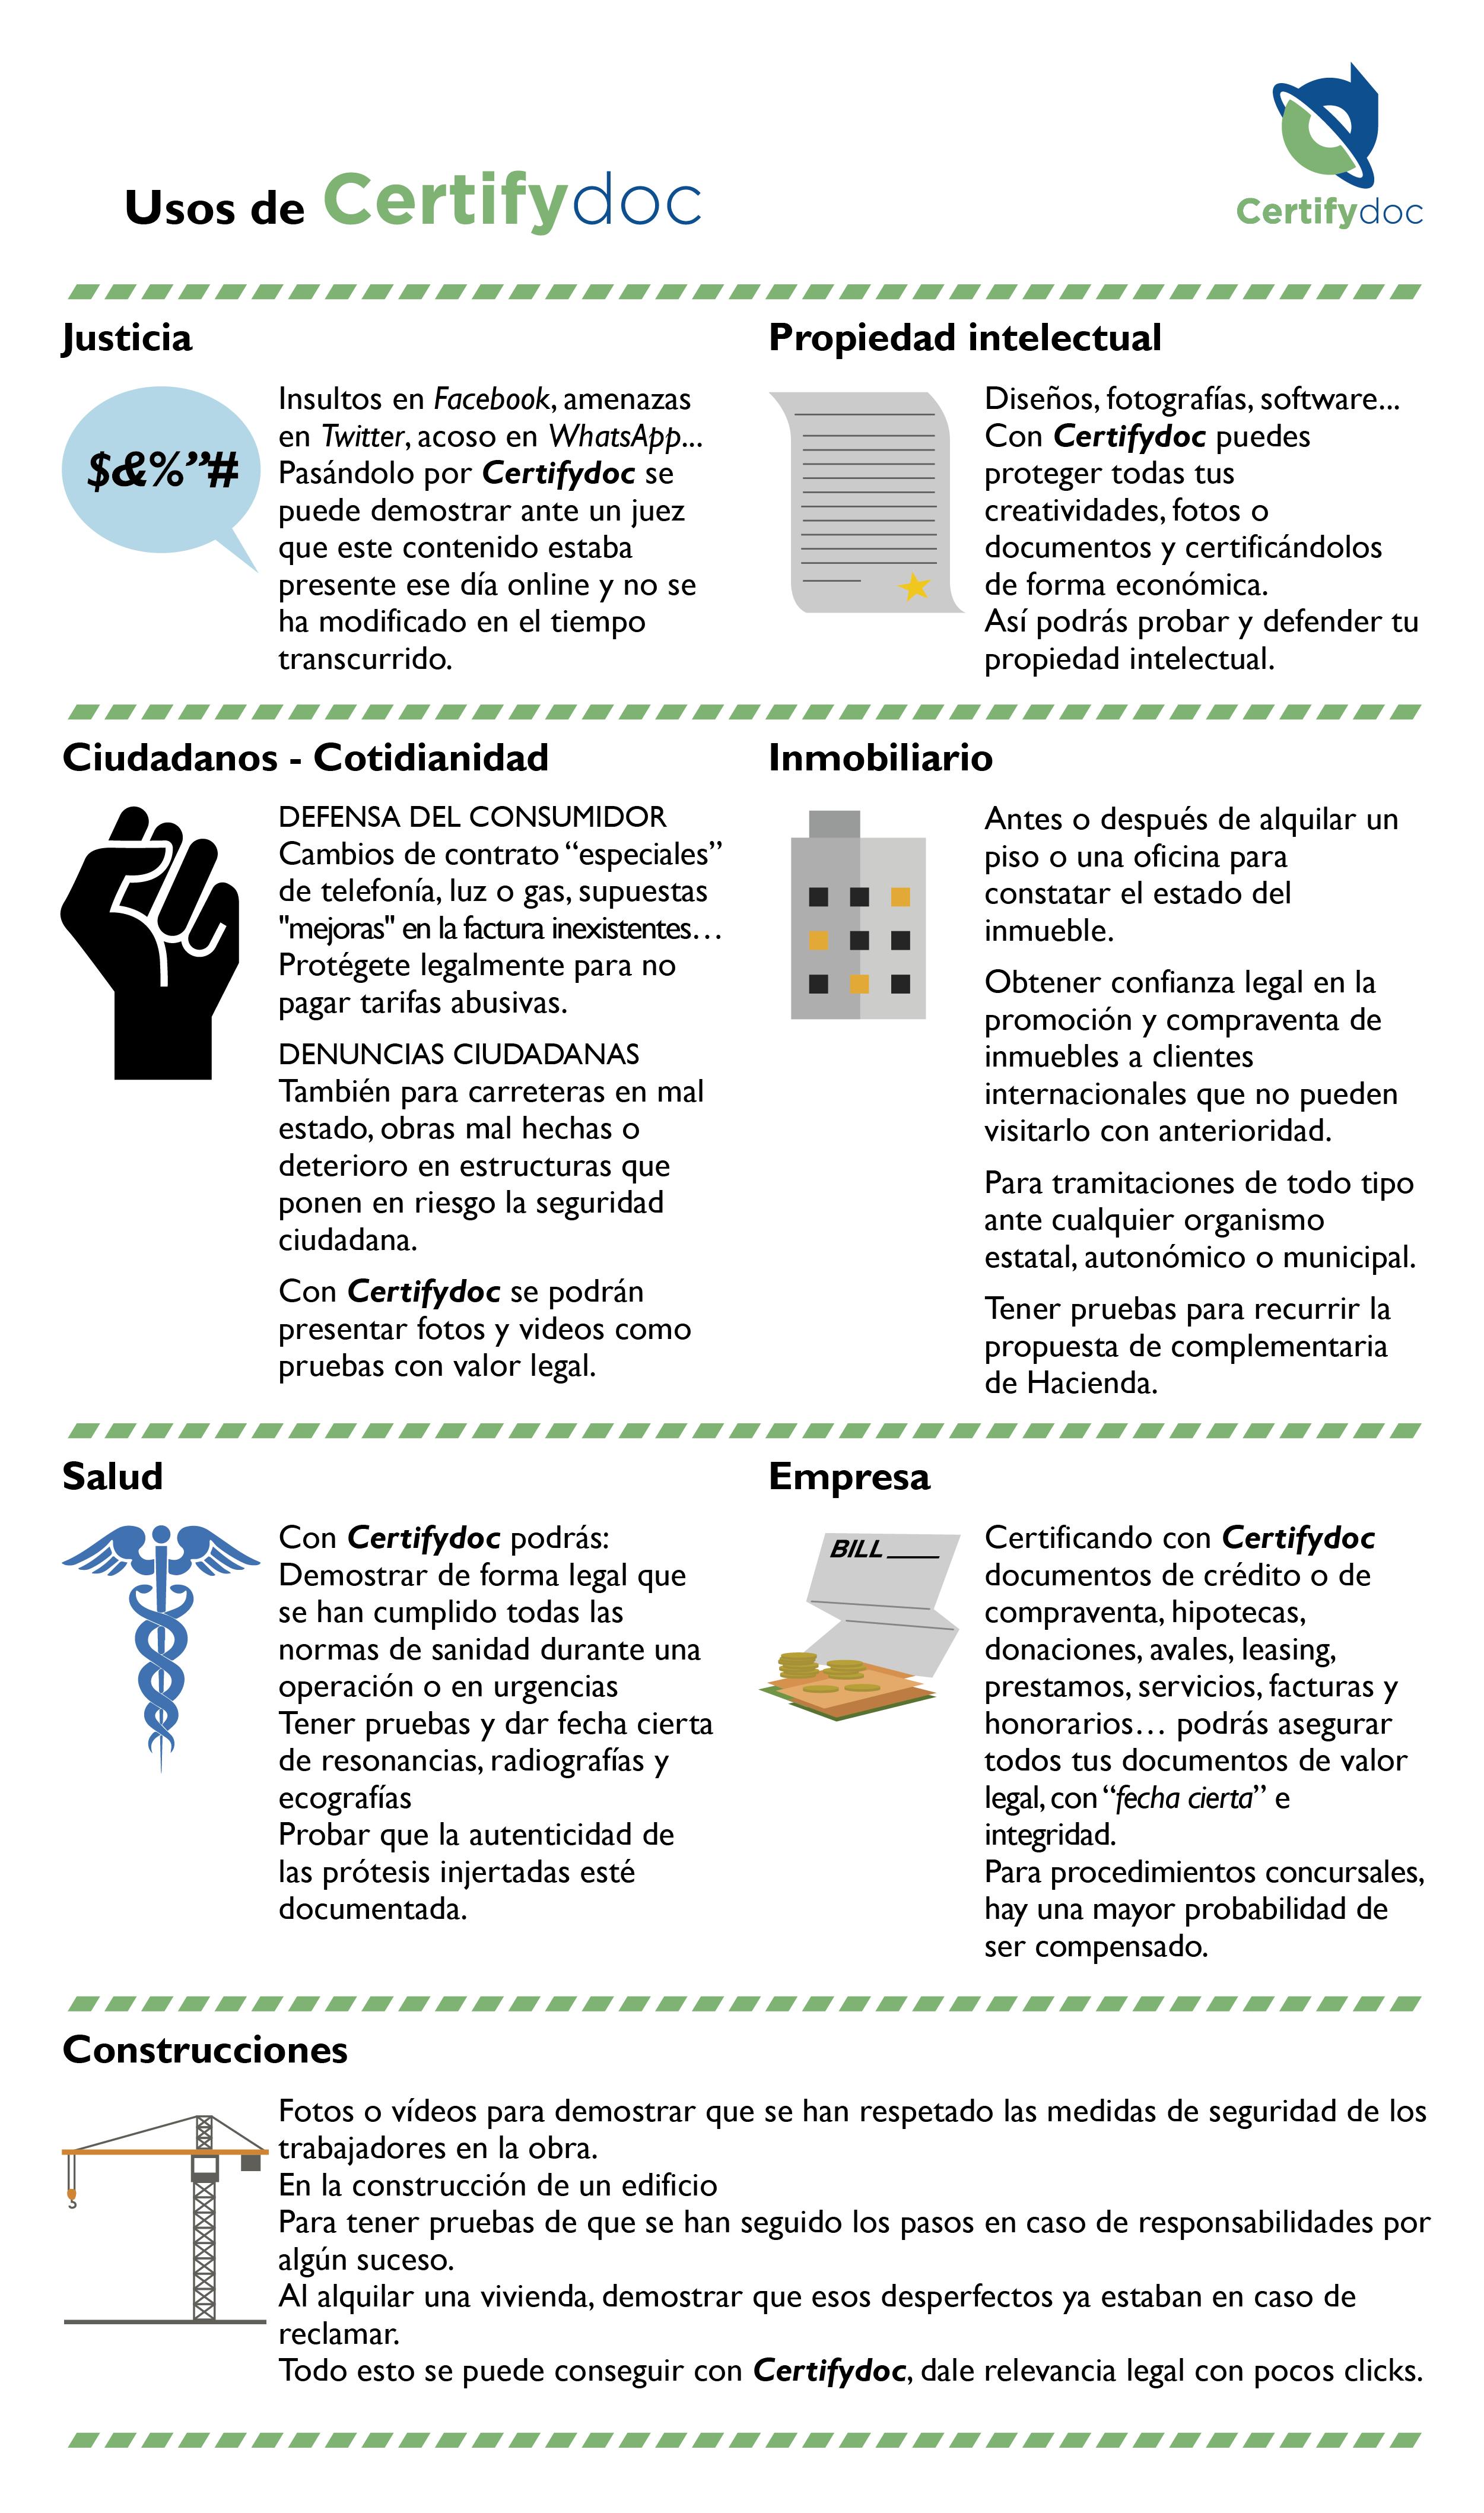 Infografia-Usos-Certifydoc